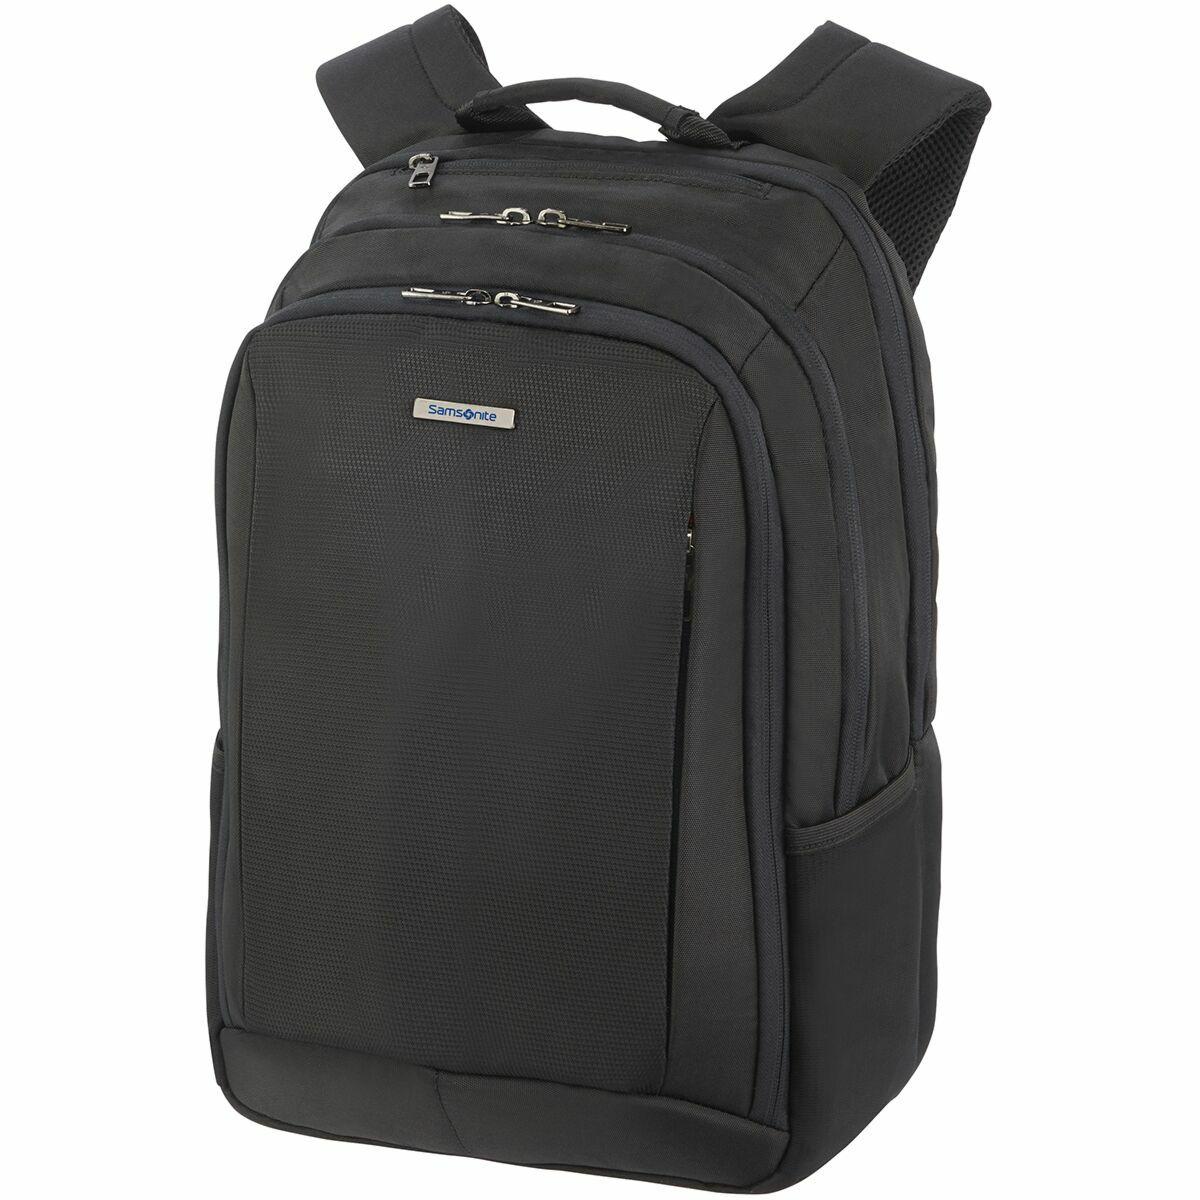 "Samsonite Guard-IT 2.0 SP Laptop Backpack M 15.6"" - Black £22.99 @ Robert Dyas (Free Click & Collect)"